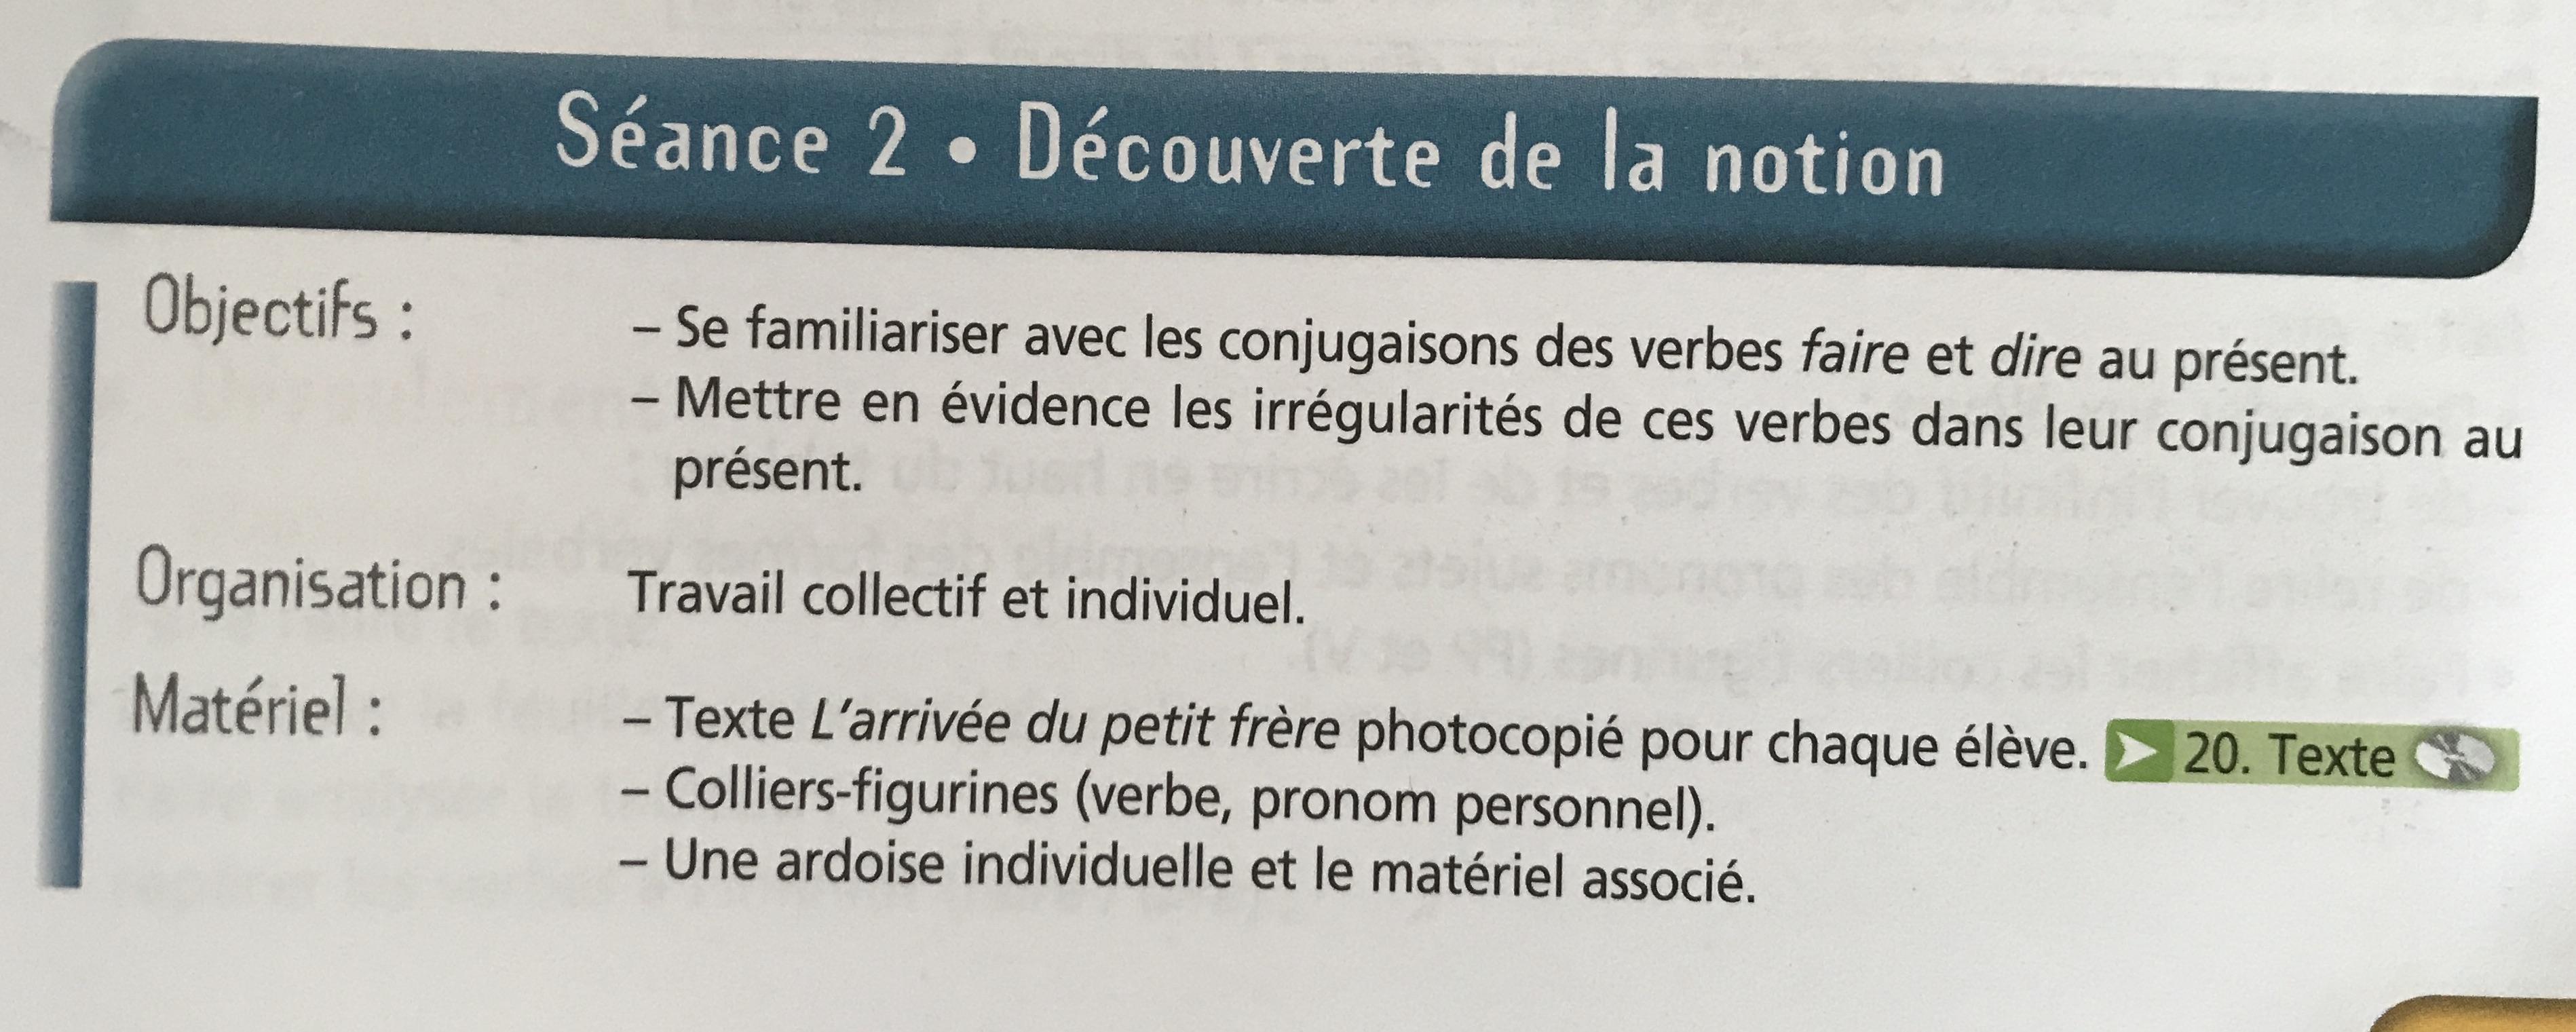 Ce1 Vendredi 5 Juin Ecole De La Boutonne